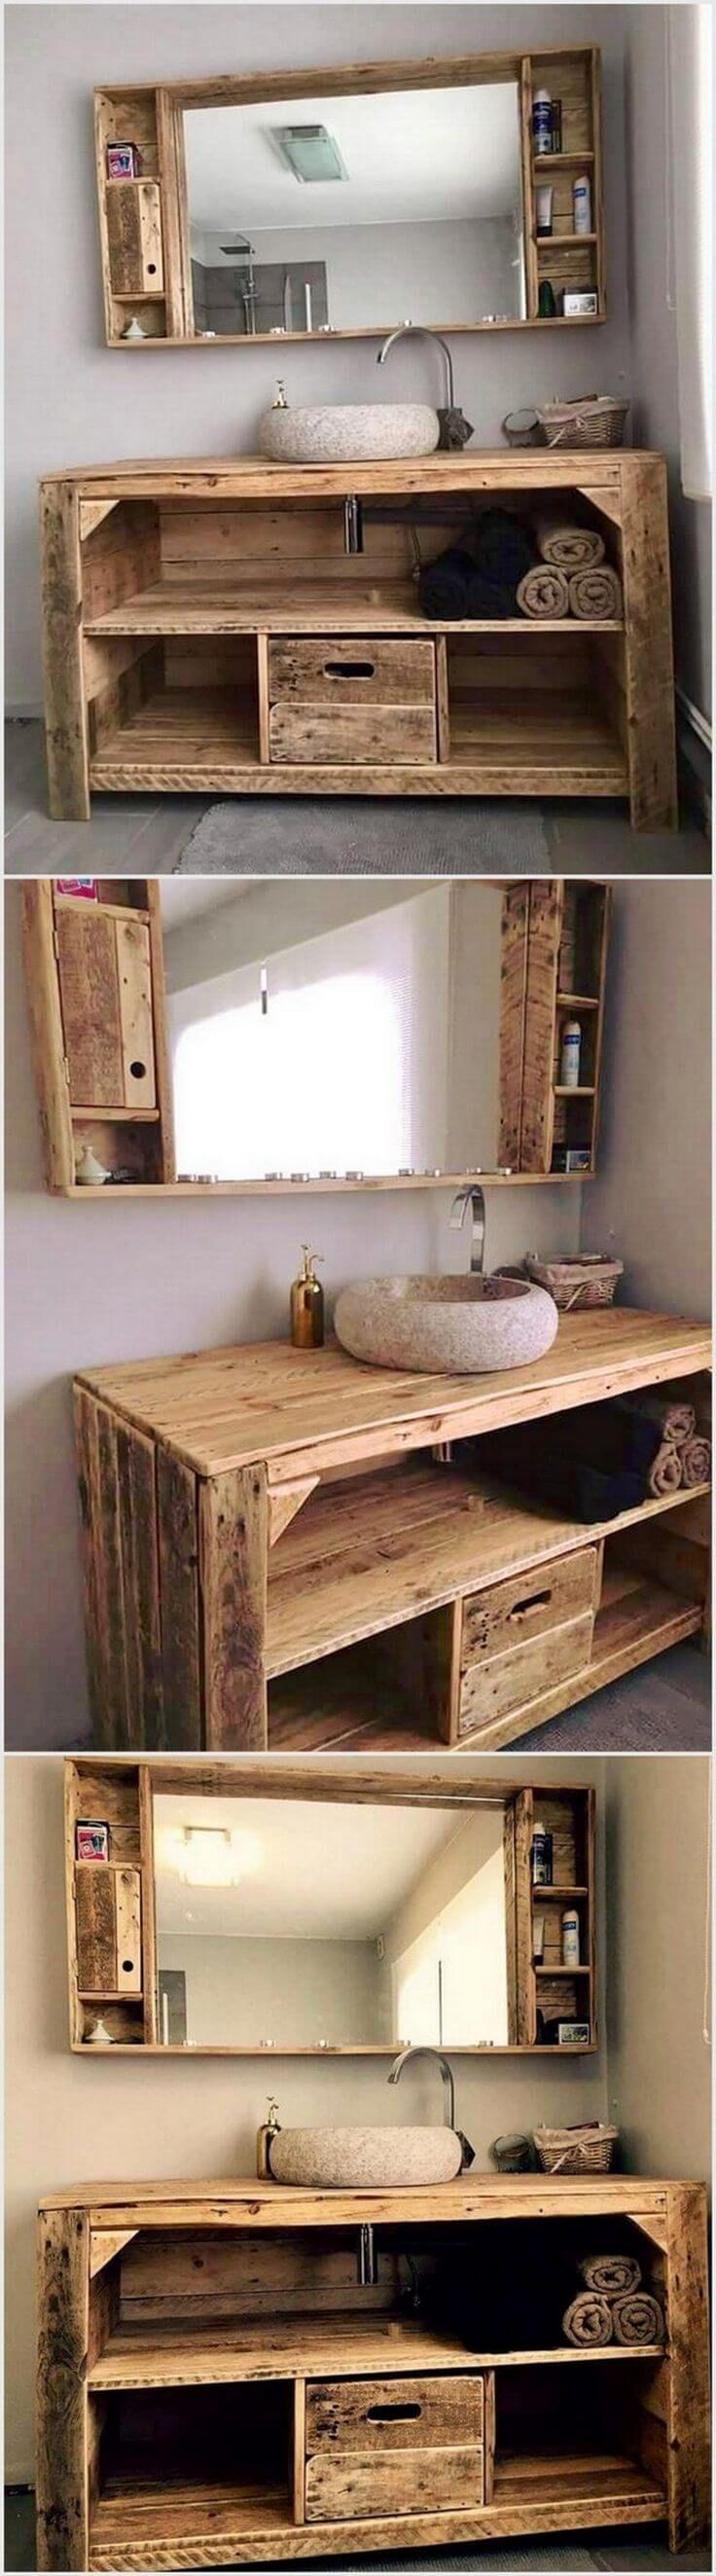 Multi Purpose DIY Pallet Project Ideas 13713 best